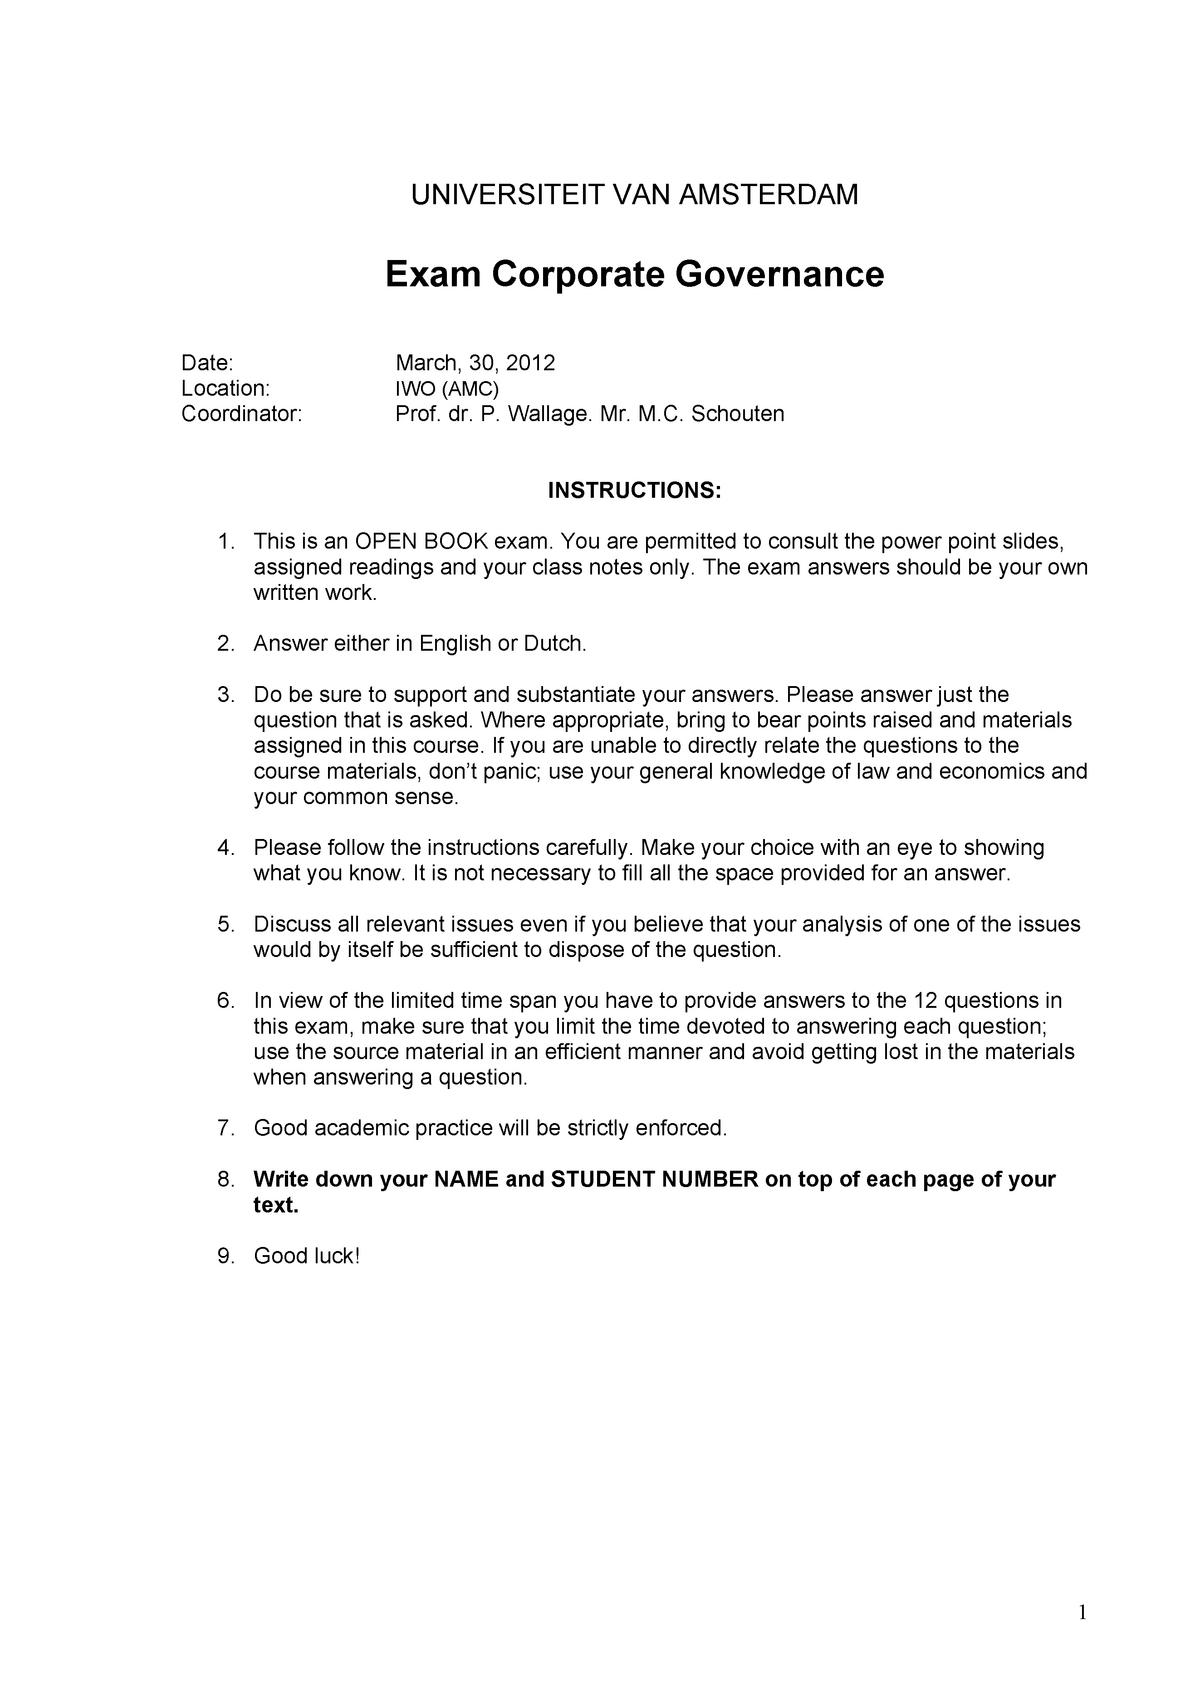 Exam 2012 - 6012B0266Y: Corporate Governance - StuDocu